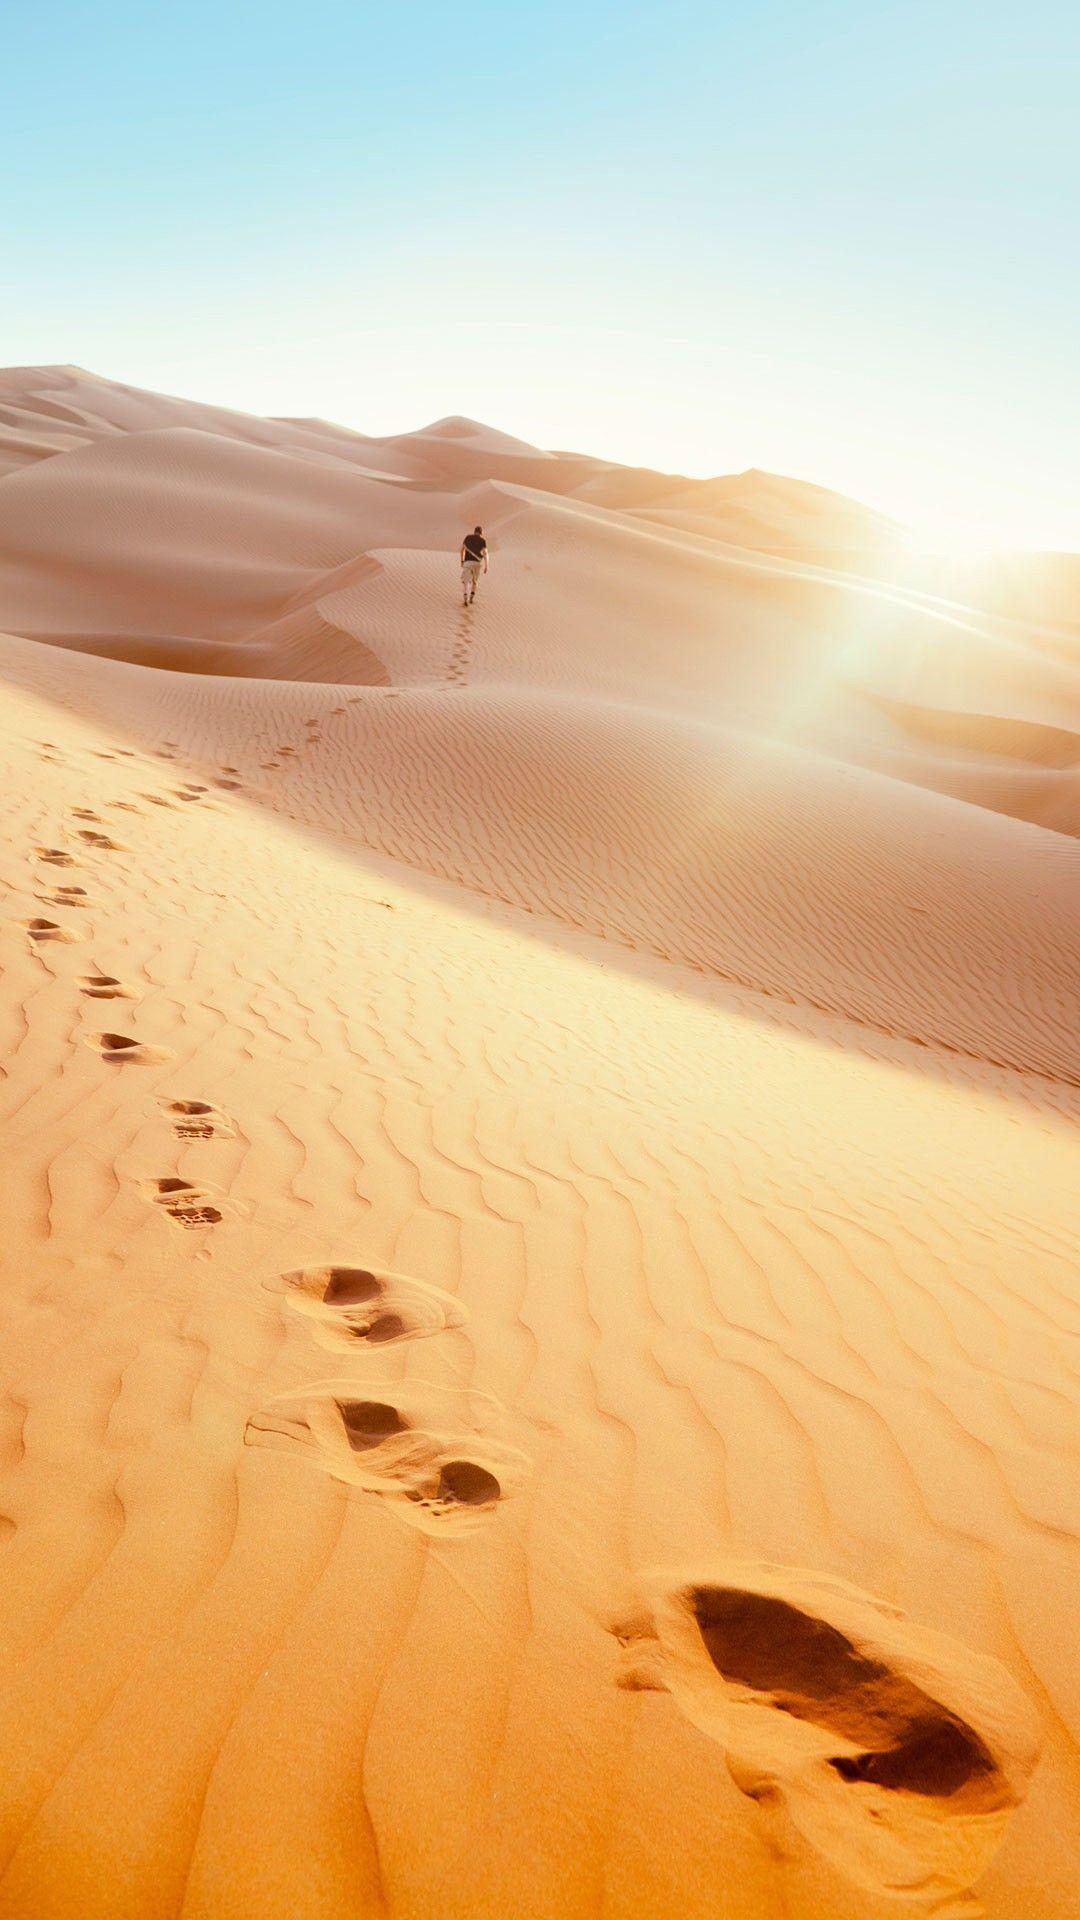 Man Footprints Desert Smartphone Wallpaper And Lockscreen Hd Check More At Https Phonewallp Nature Iphone Wallpaper Best Wallpapers Android Wonder Wallpaper